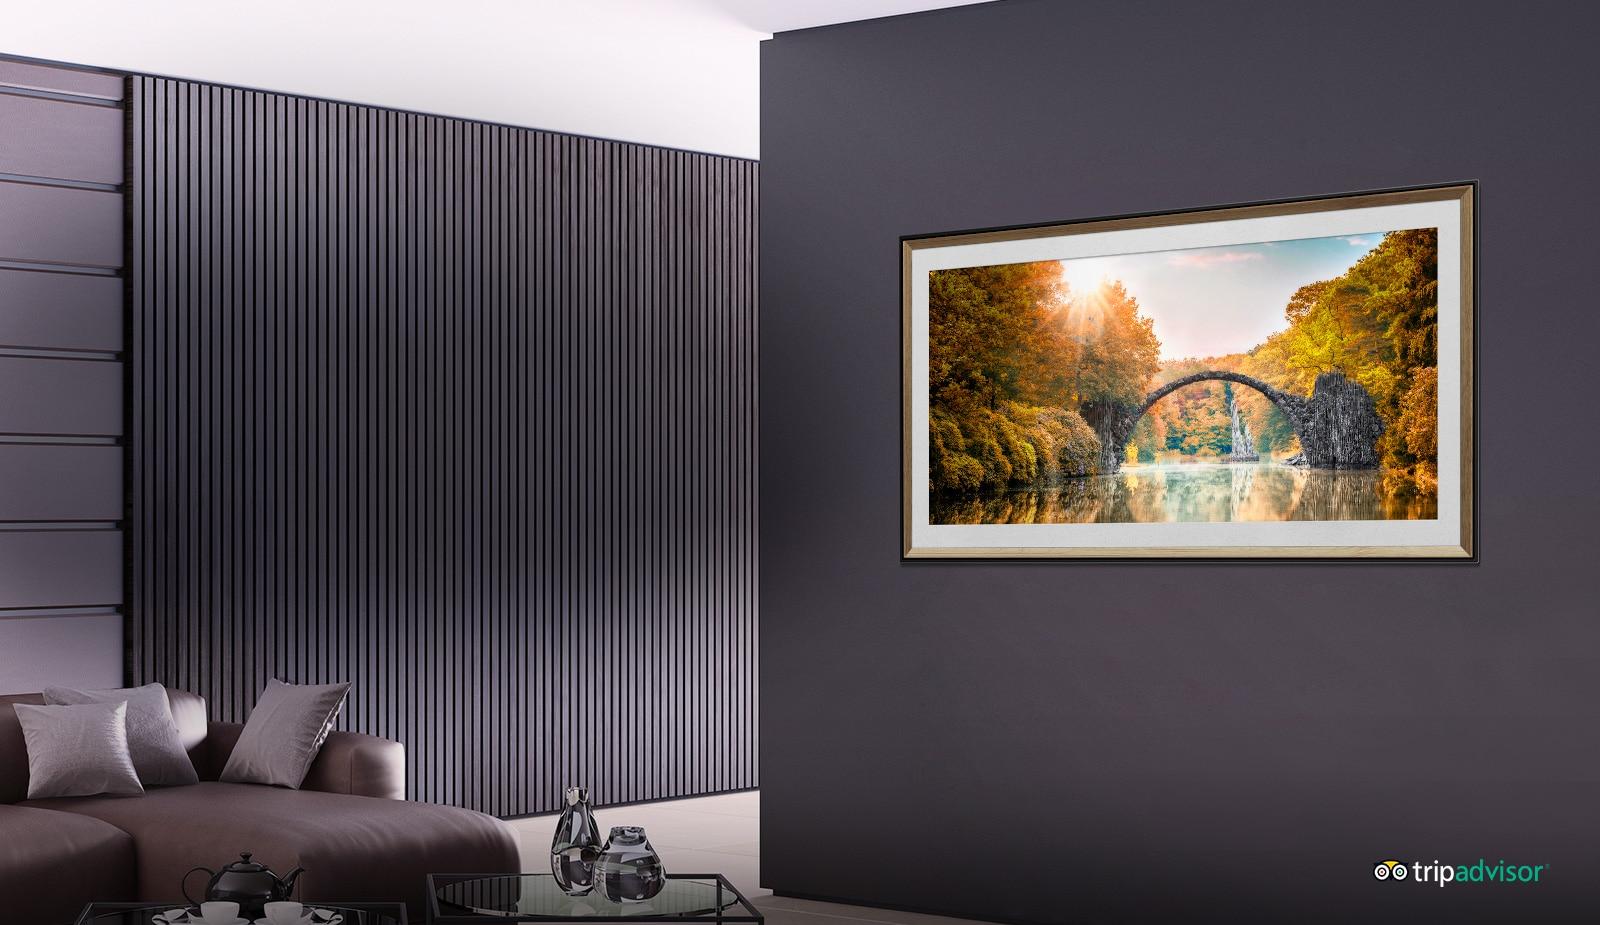 TV-OLED-C9-A-07-Gallery-Mode-Desktop